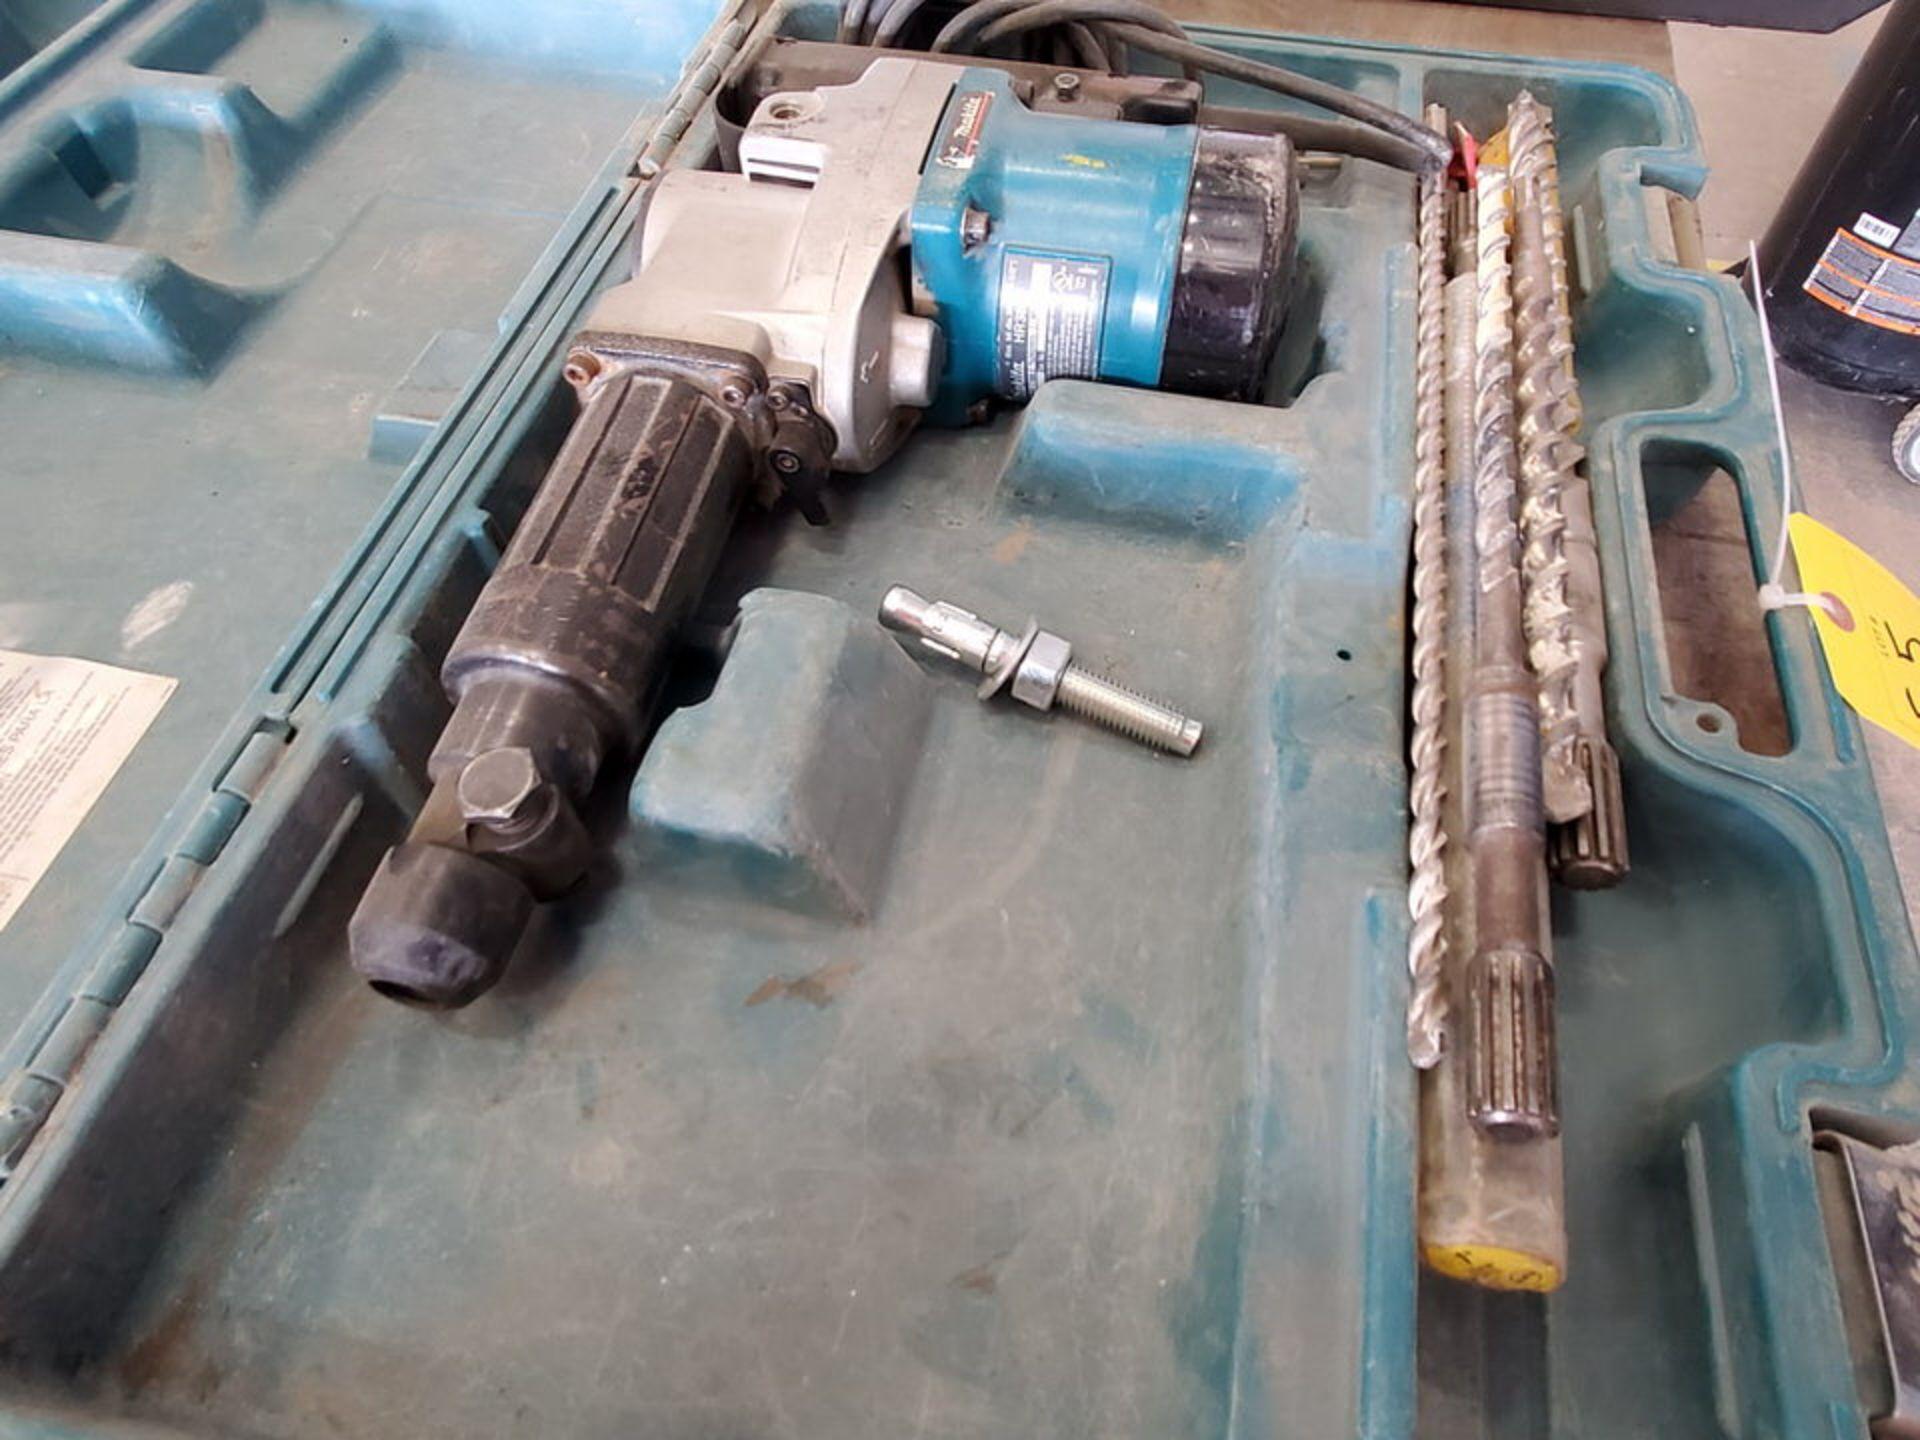 "Makita HR3851 1/2"" Rotary Hammer 120V, 10A, 2900RPM - Image 2 of 5"